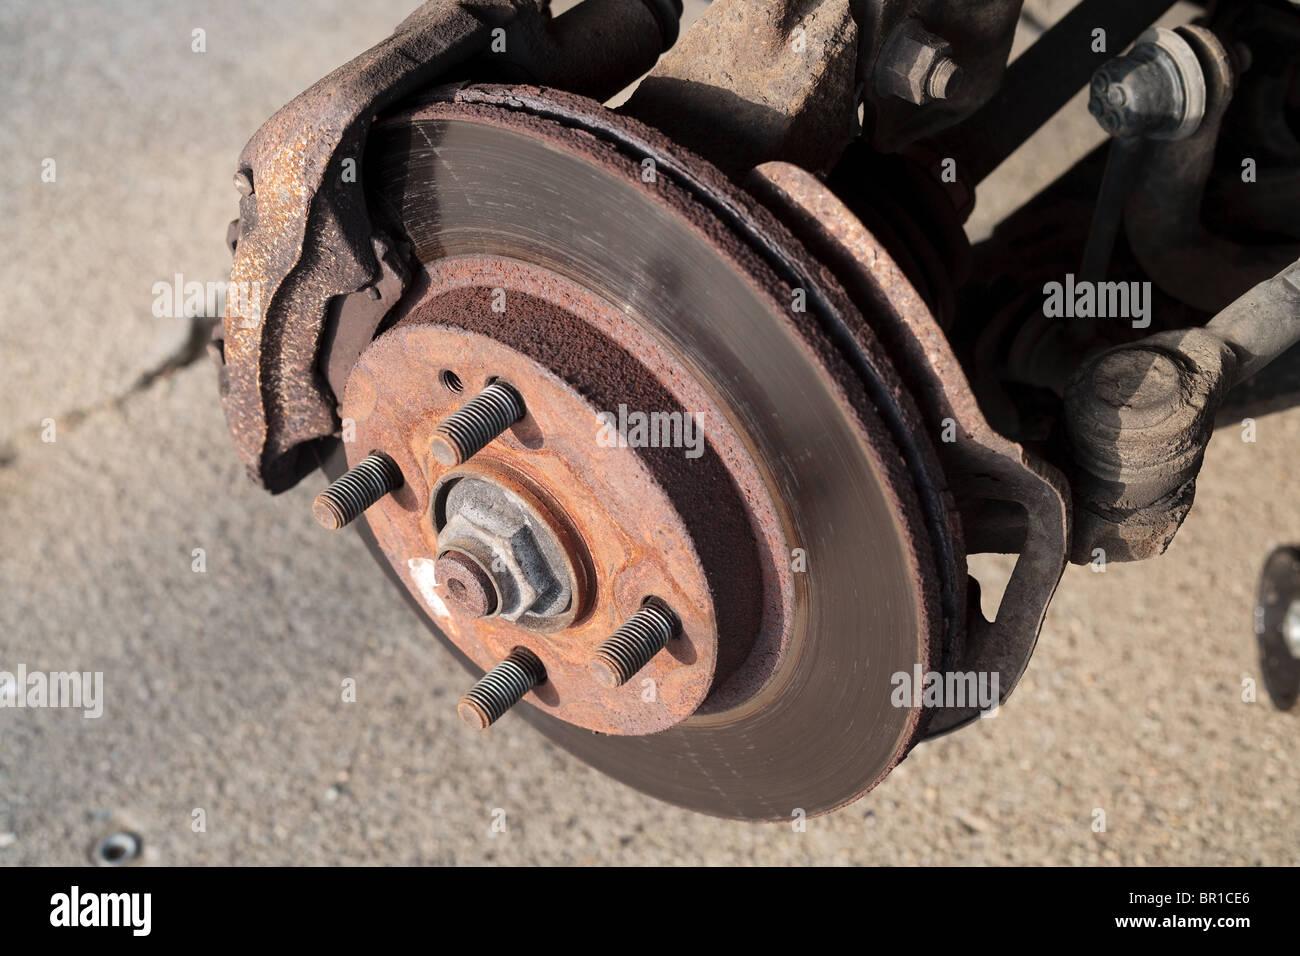 A car's brake caliper and rotor - Stock Image